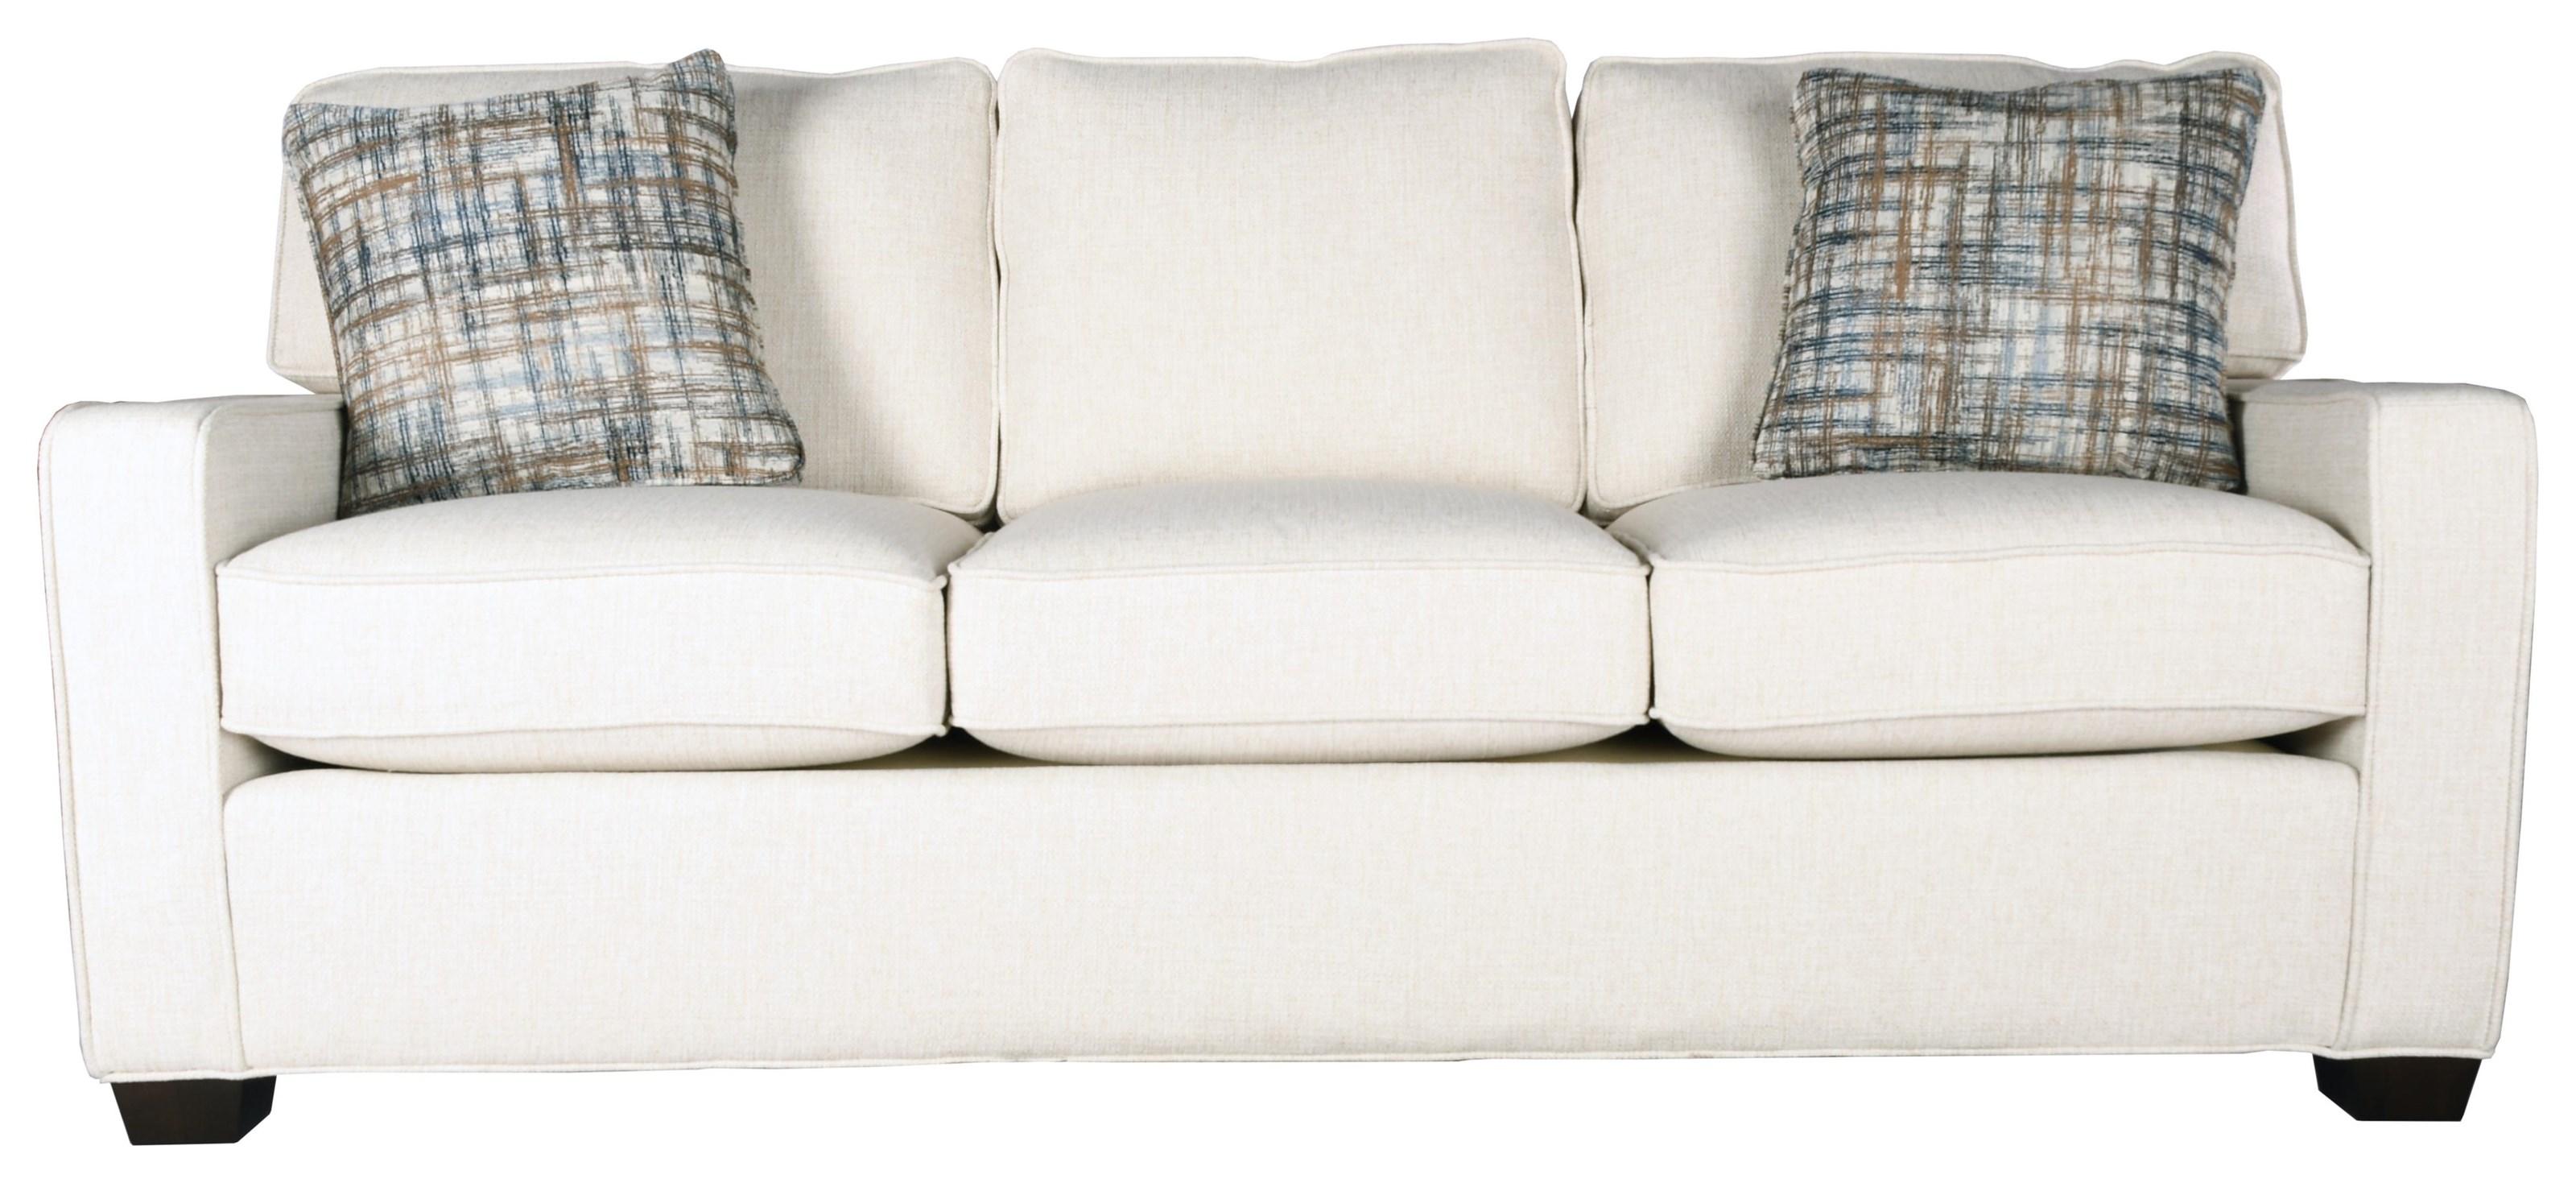 Madison Sofa at Bennett's Furniture and Mattresses